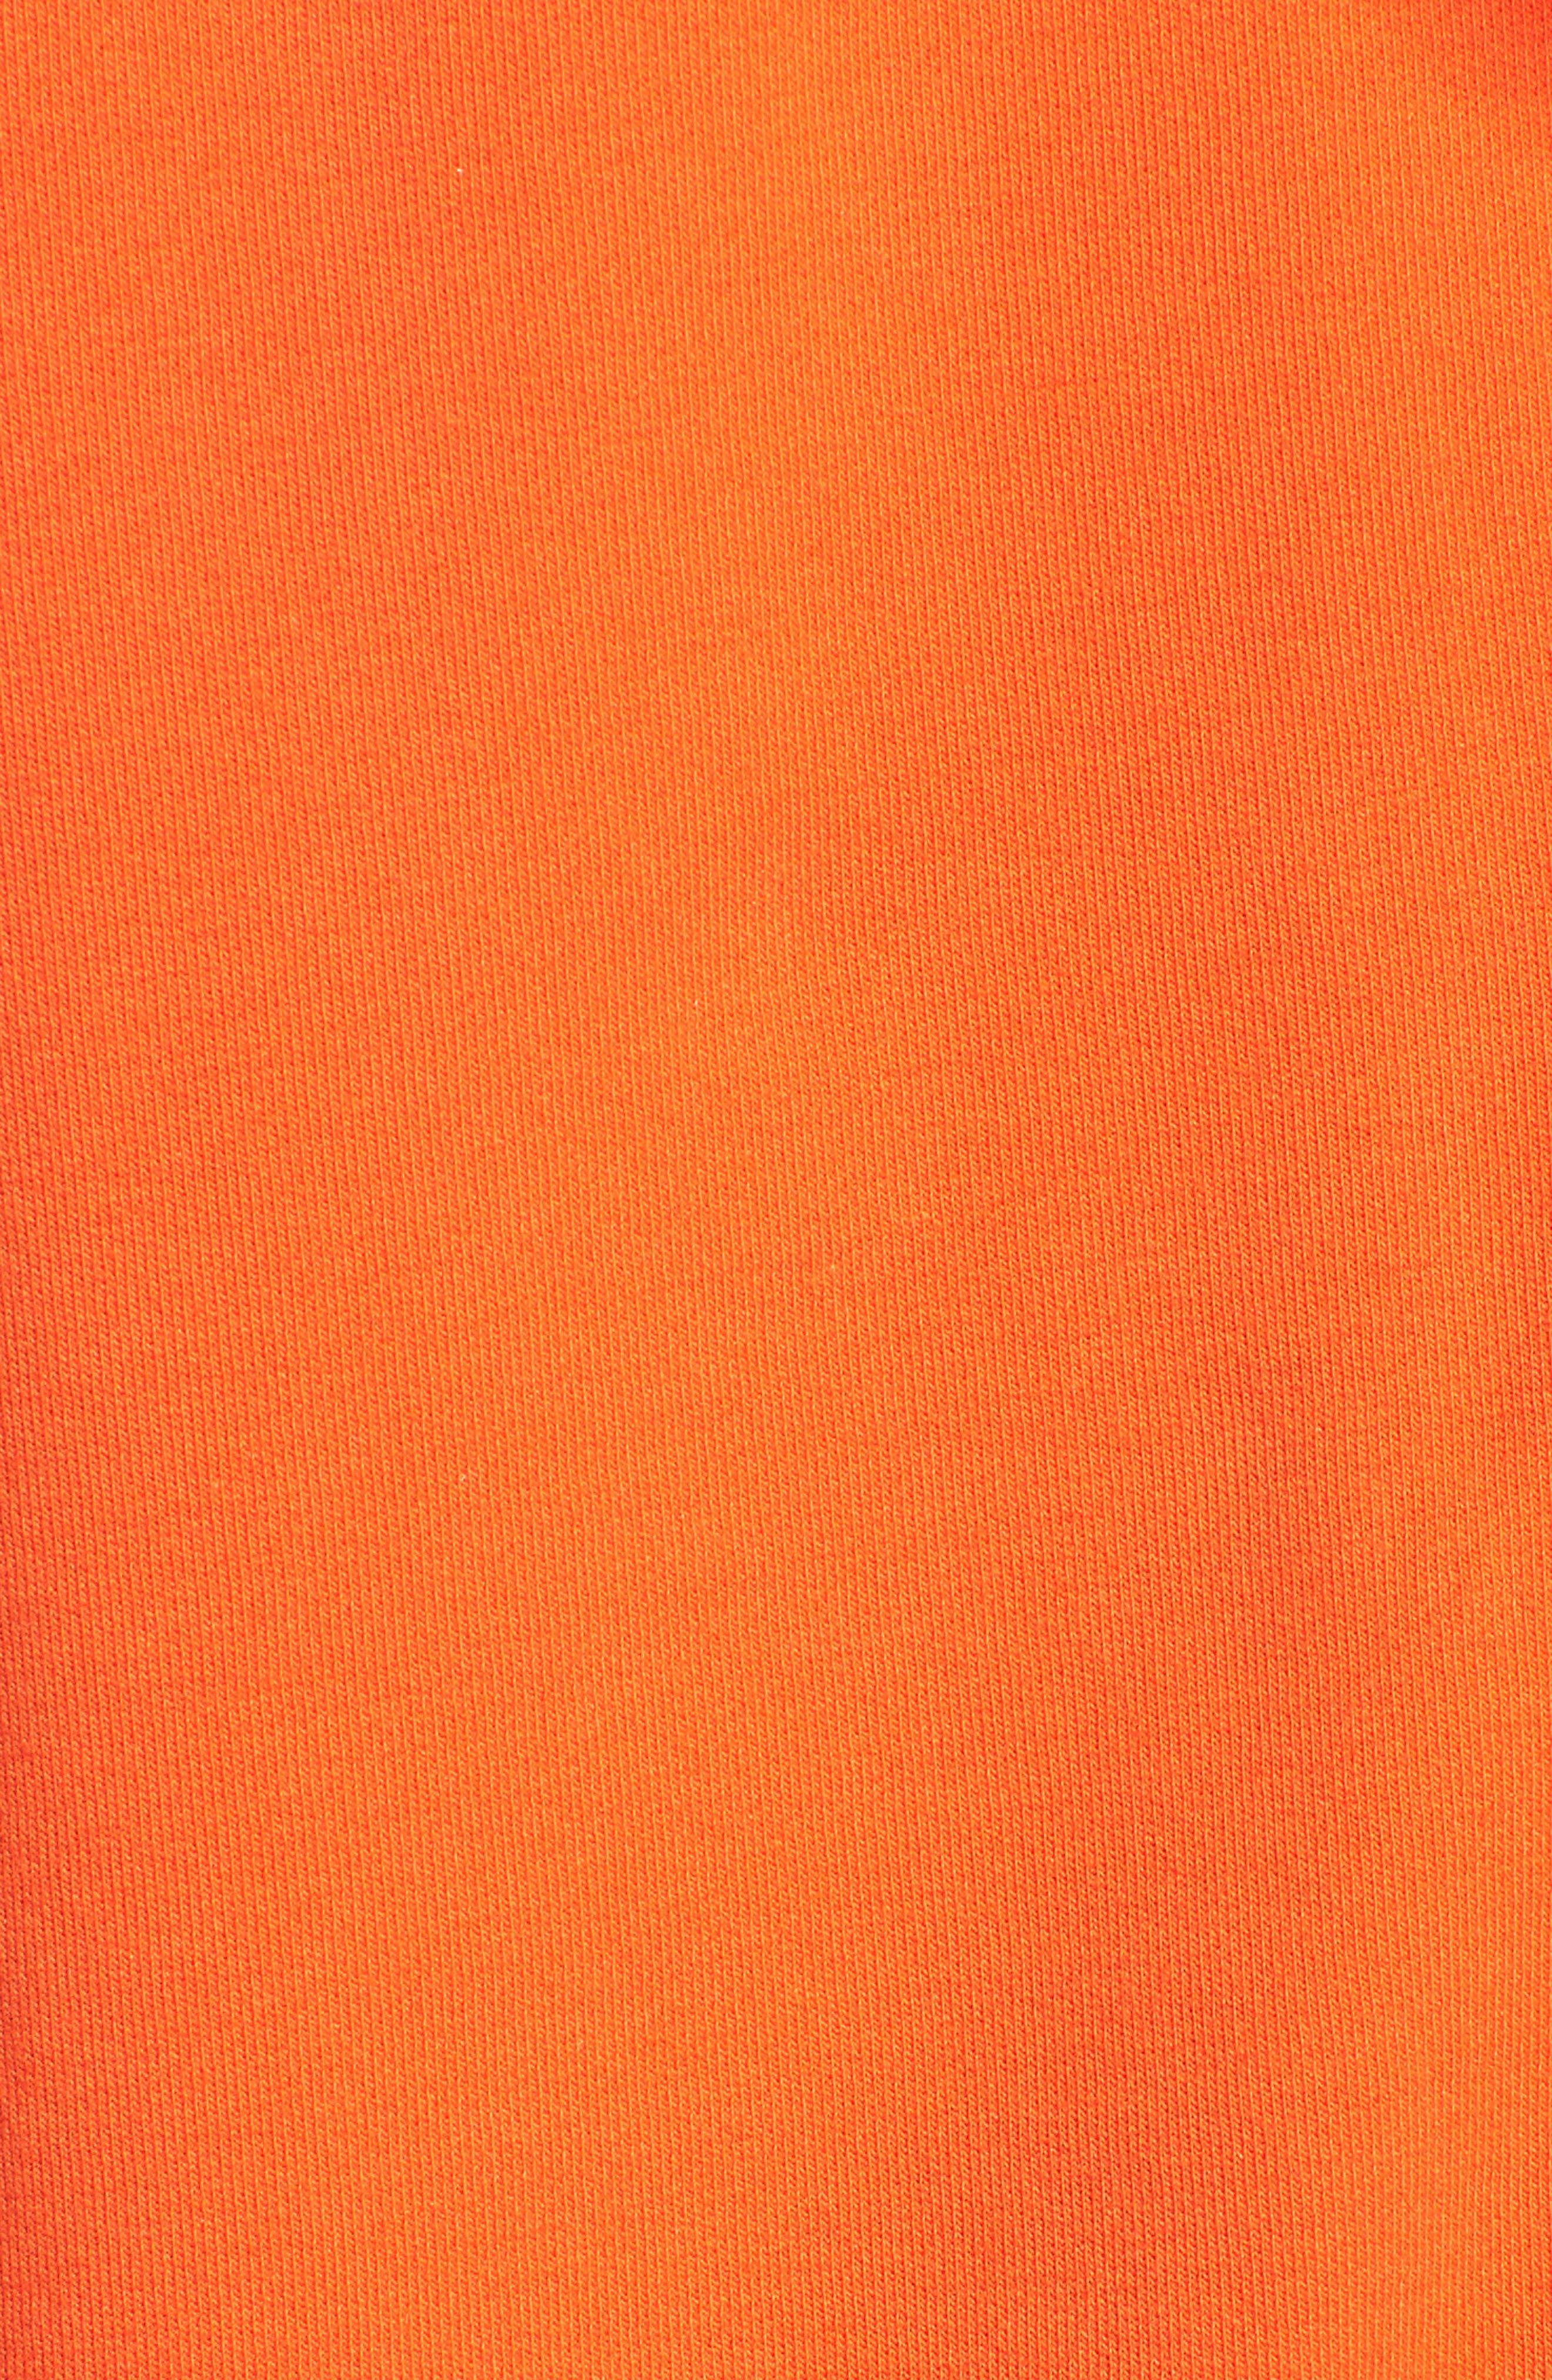 FENTY PUMA by Rihanna Back Zip Logo Hoodie,                             Alternate thumbnail 6, color,                             600